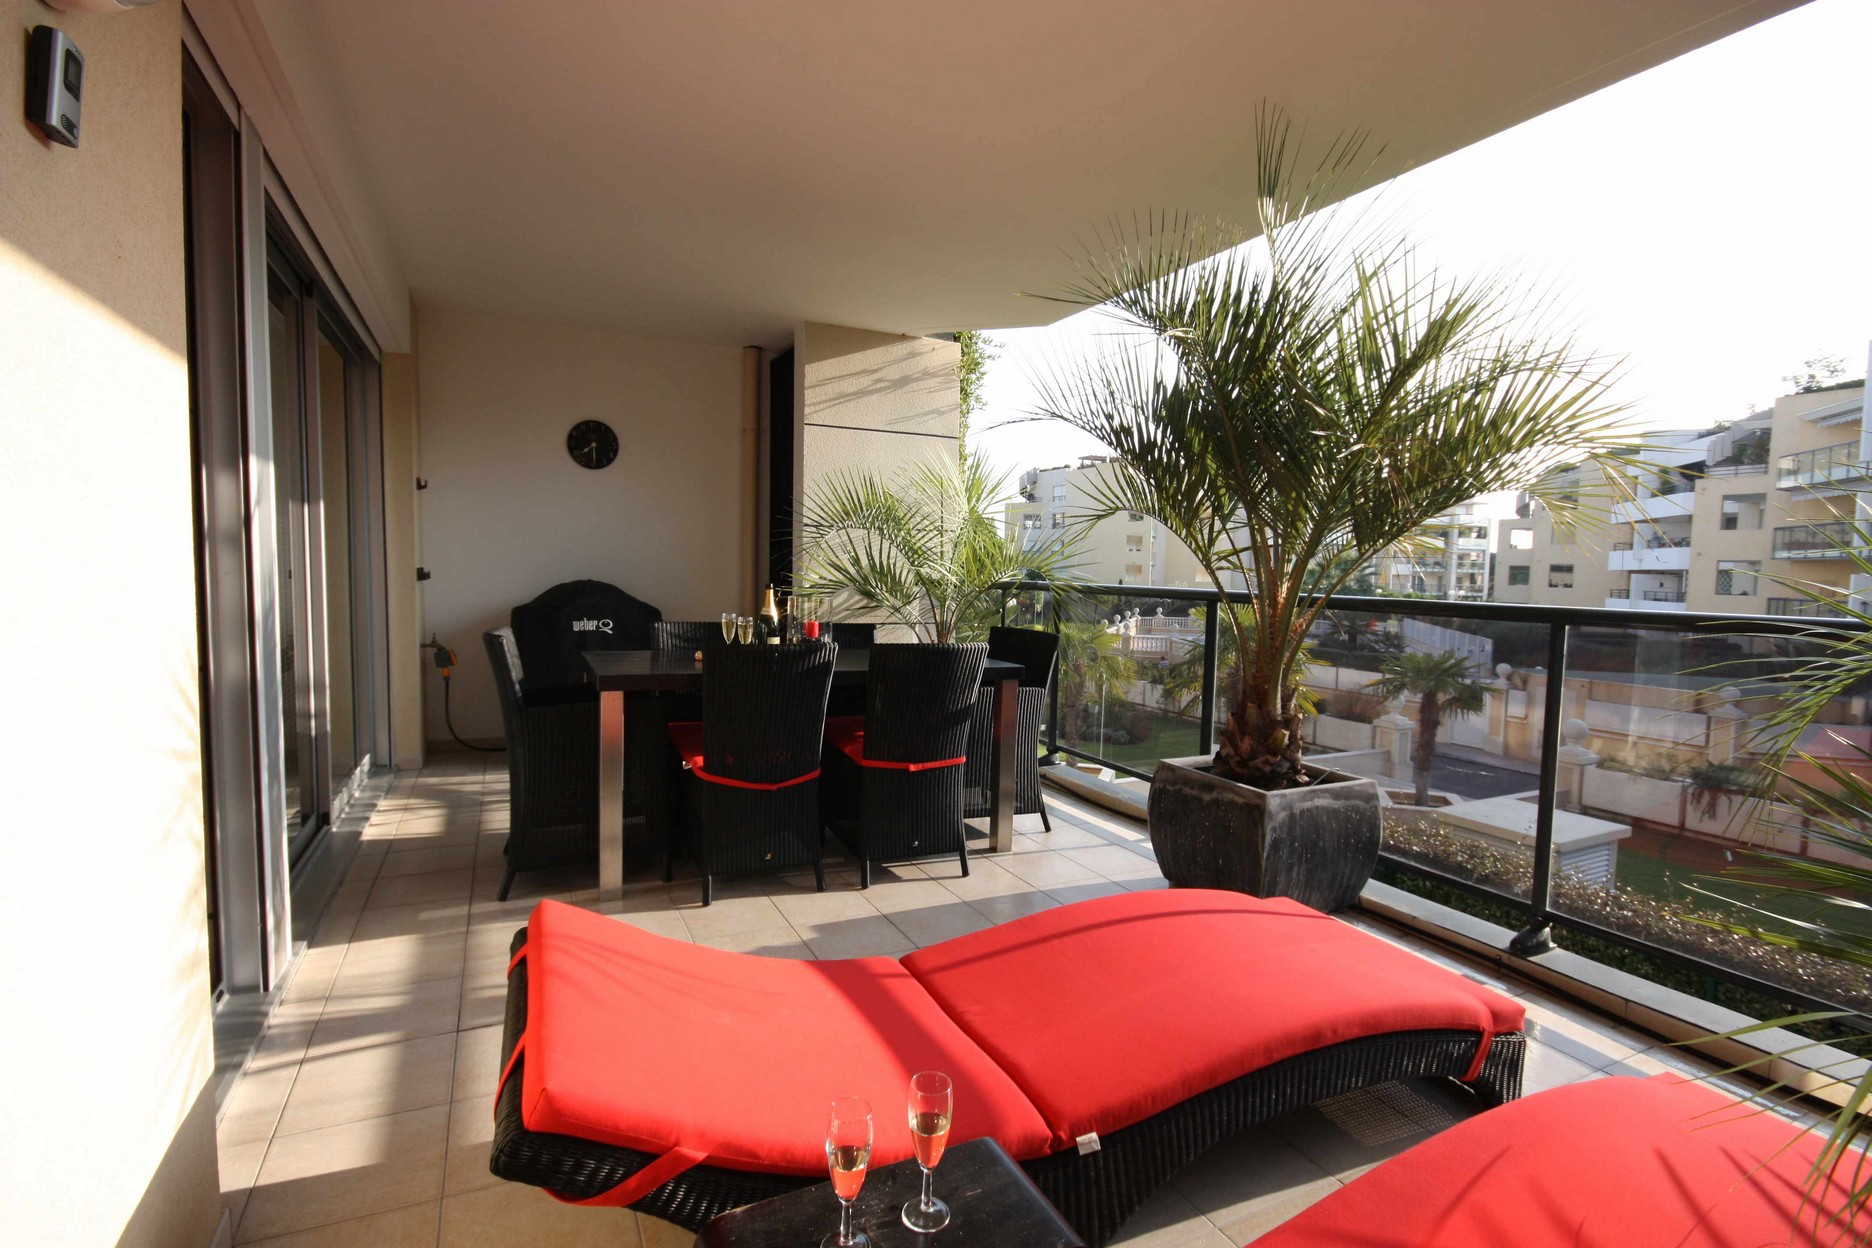 apartment balcony furniture homesfeed